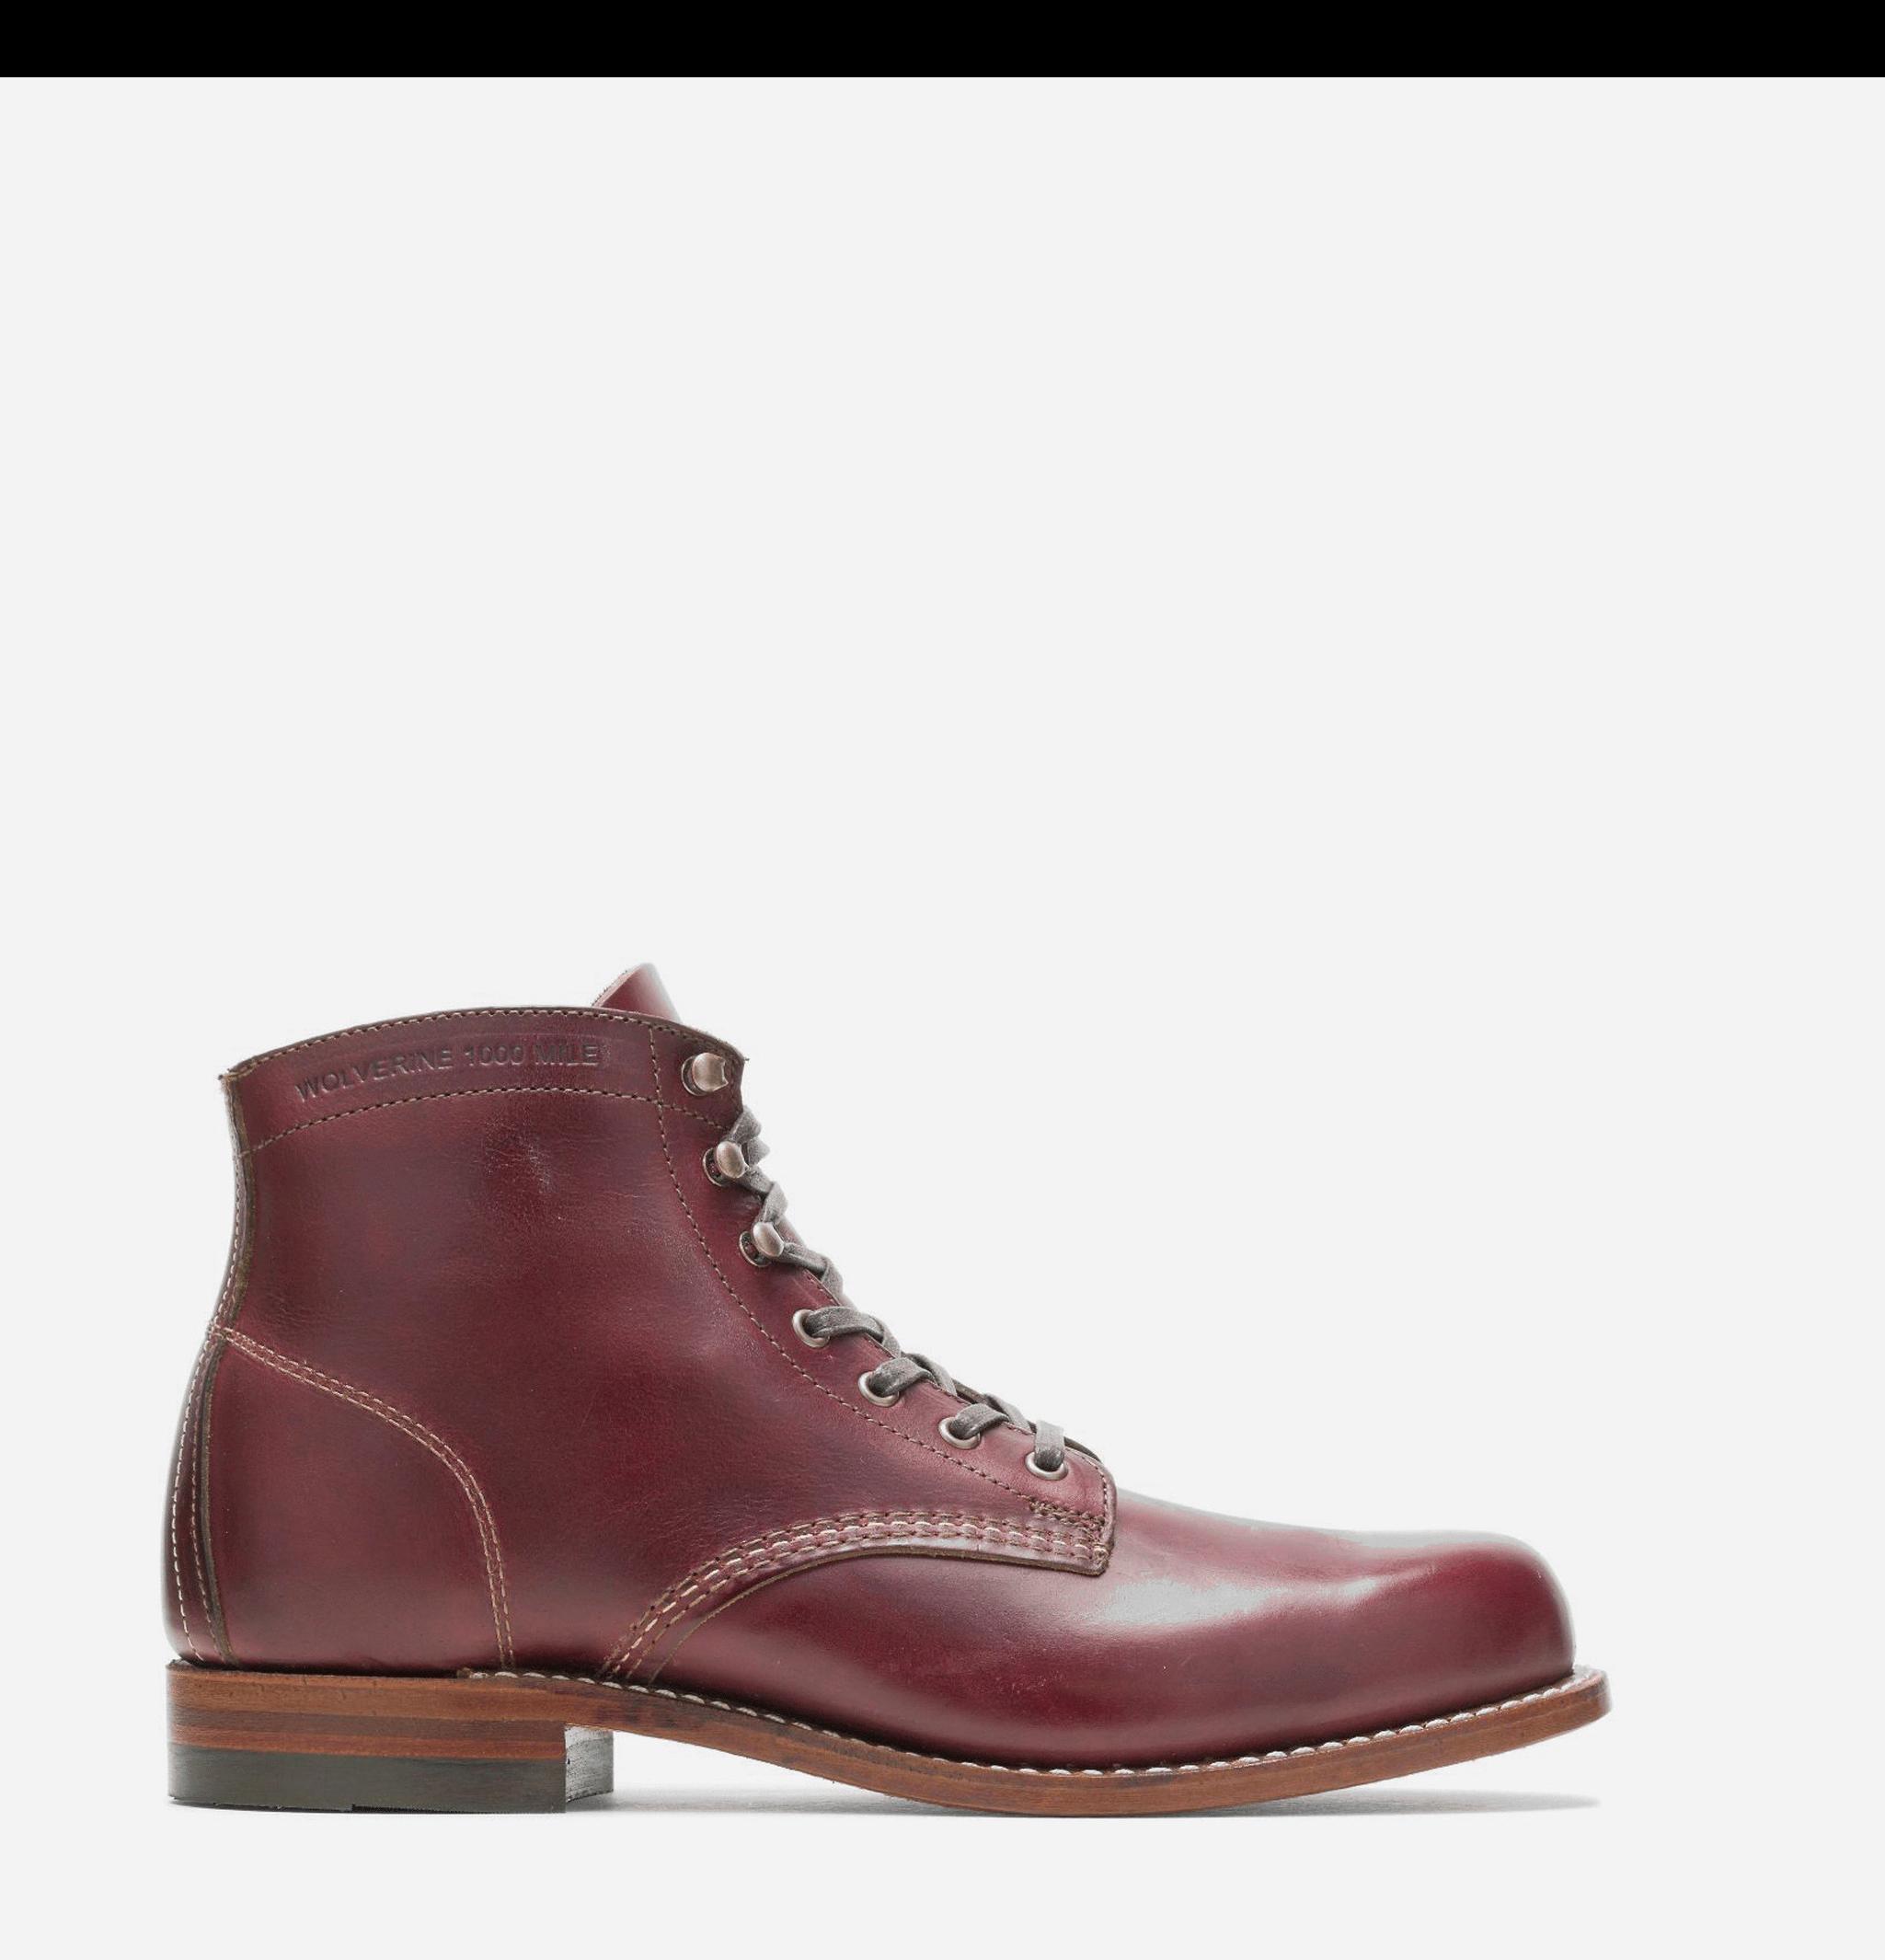 1000 Mile Boots Cordovan N°8